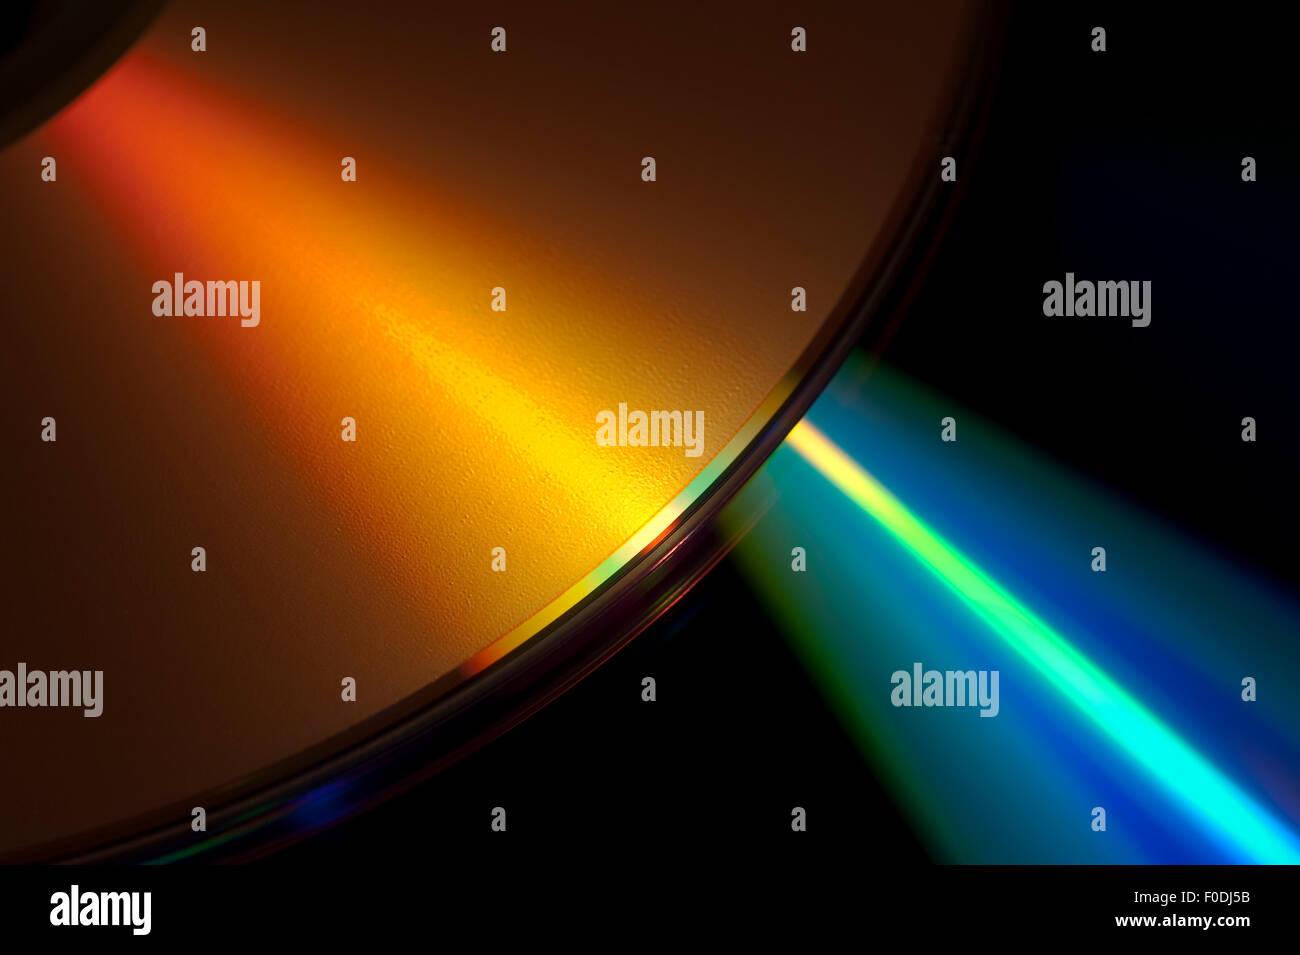 Laser on CD ROM - Stock Image